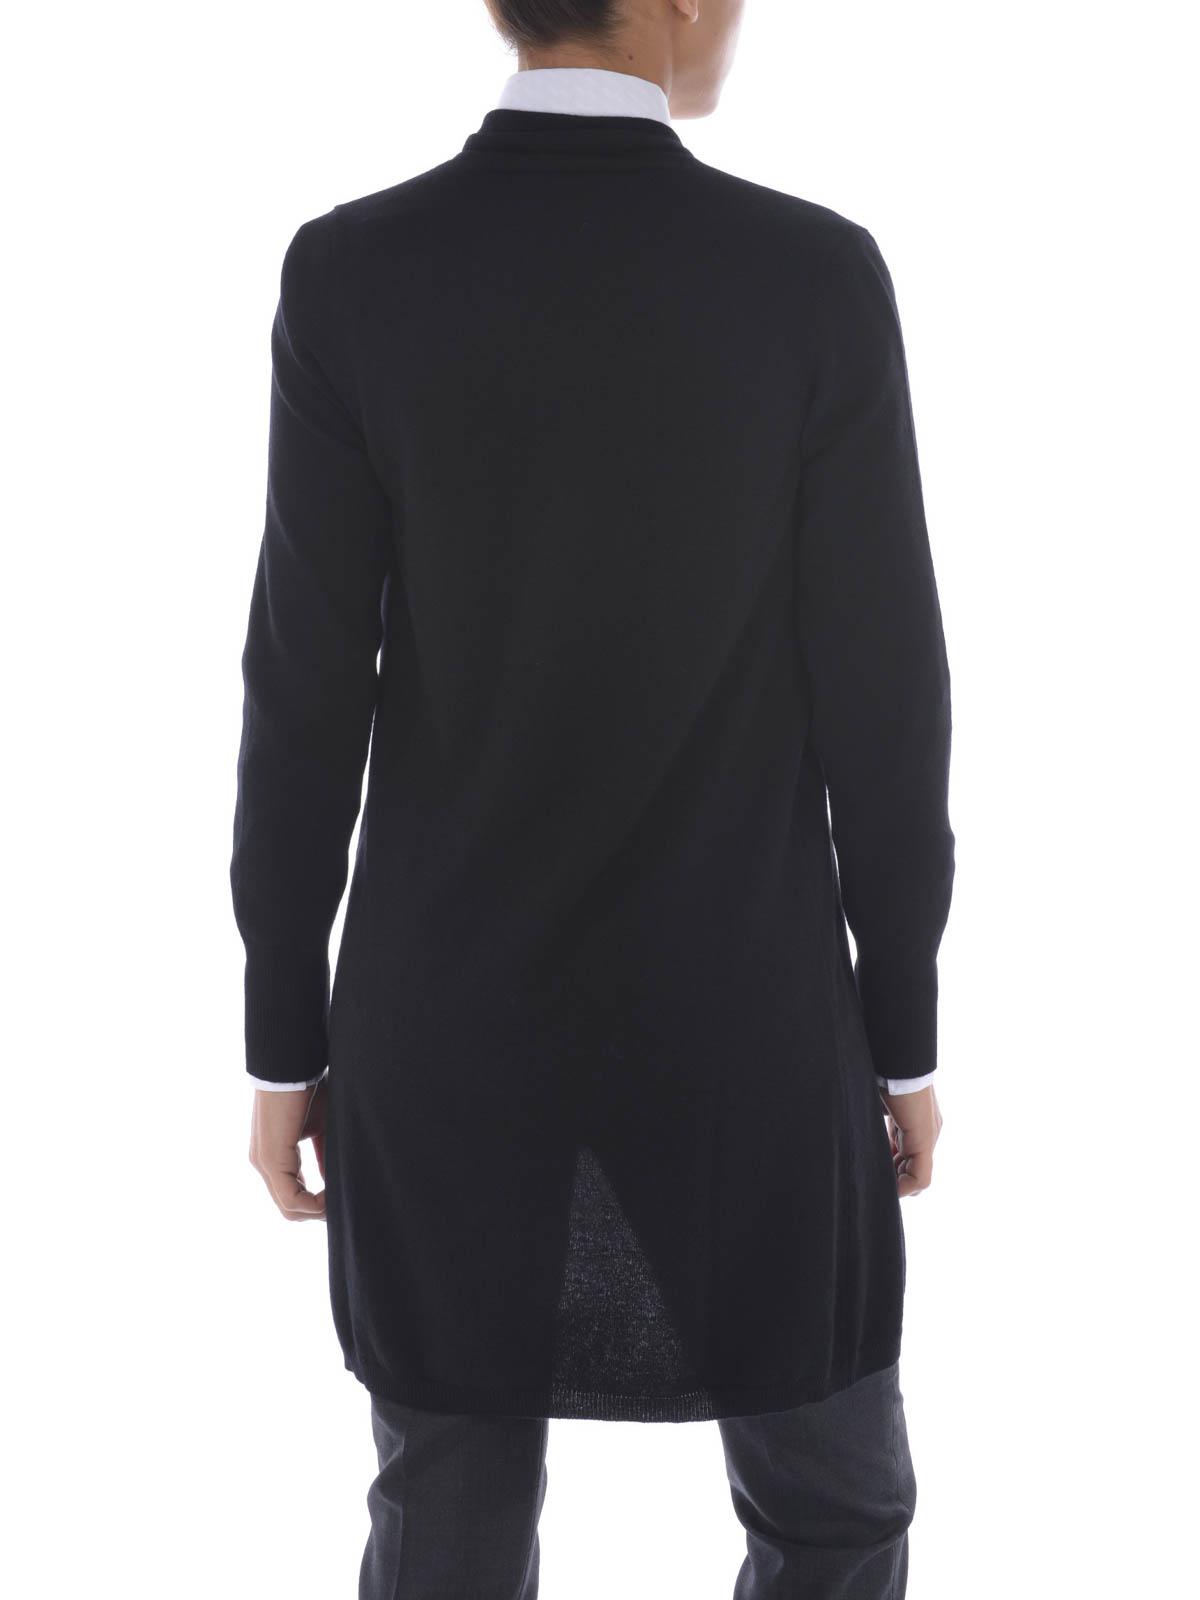 Hook fastened wool maxi cardigan by Fay - cardigans | iKRIX